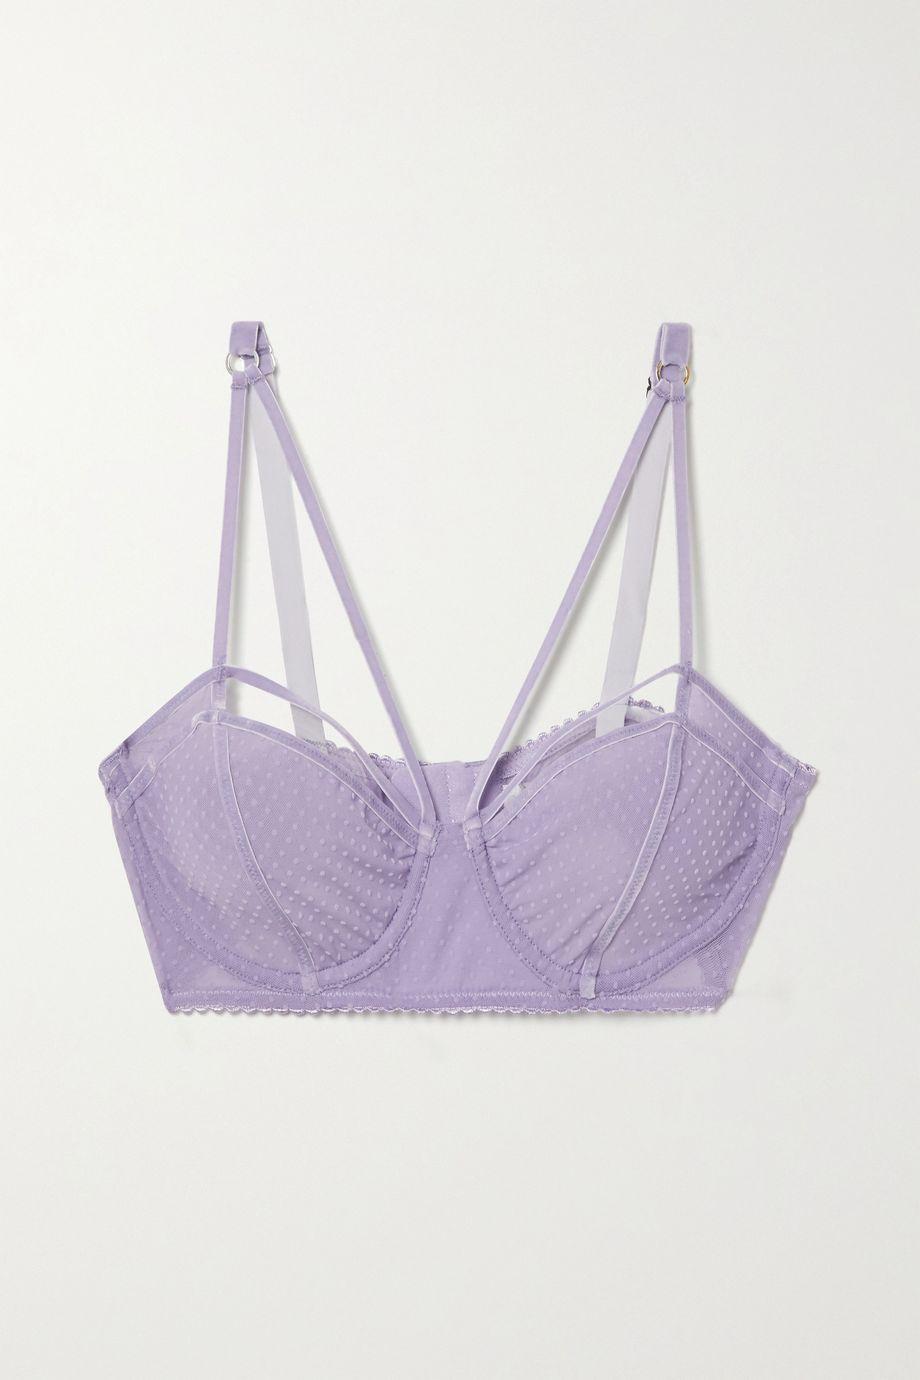 Lonely Gigi velvet-trimmed flocked stretch-tulle underwired soft-cup bra